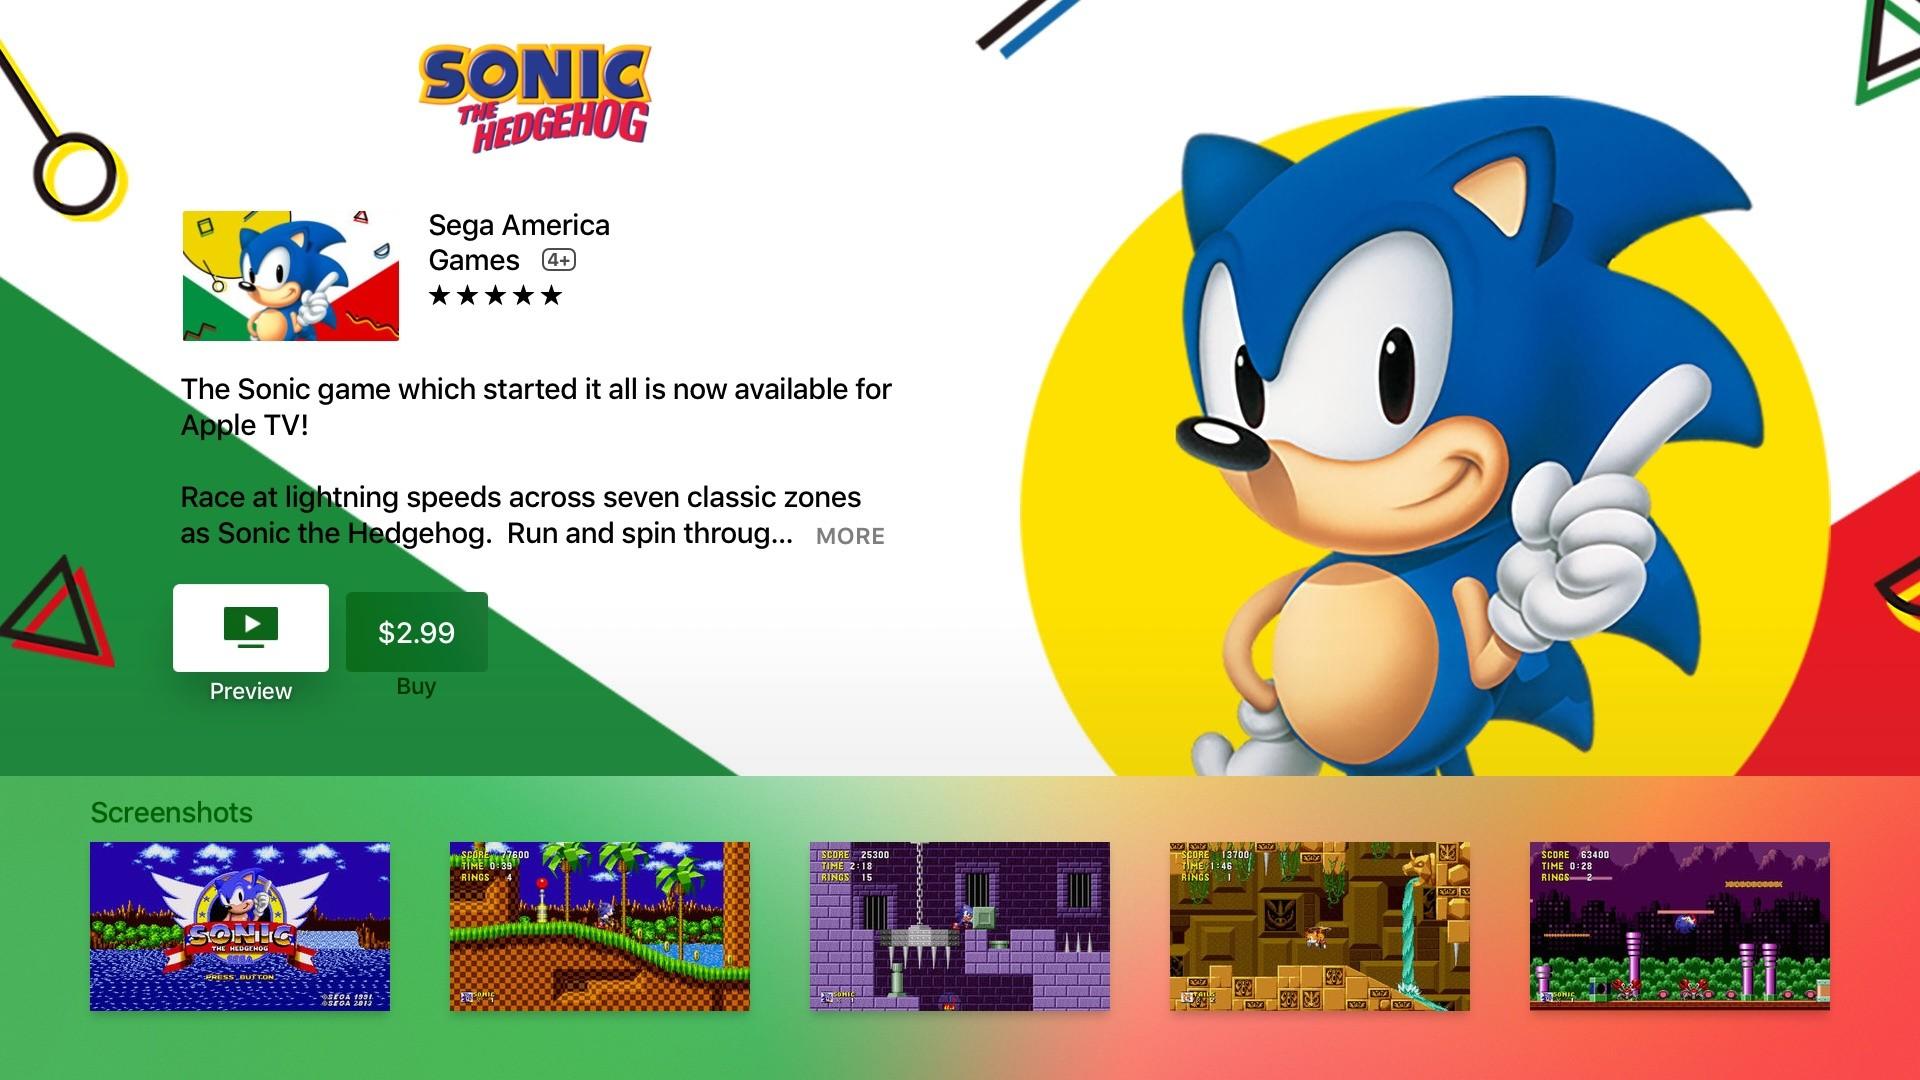 Sonic the Hedgehog for Apple TV screenshot 001